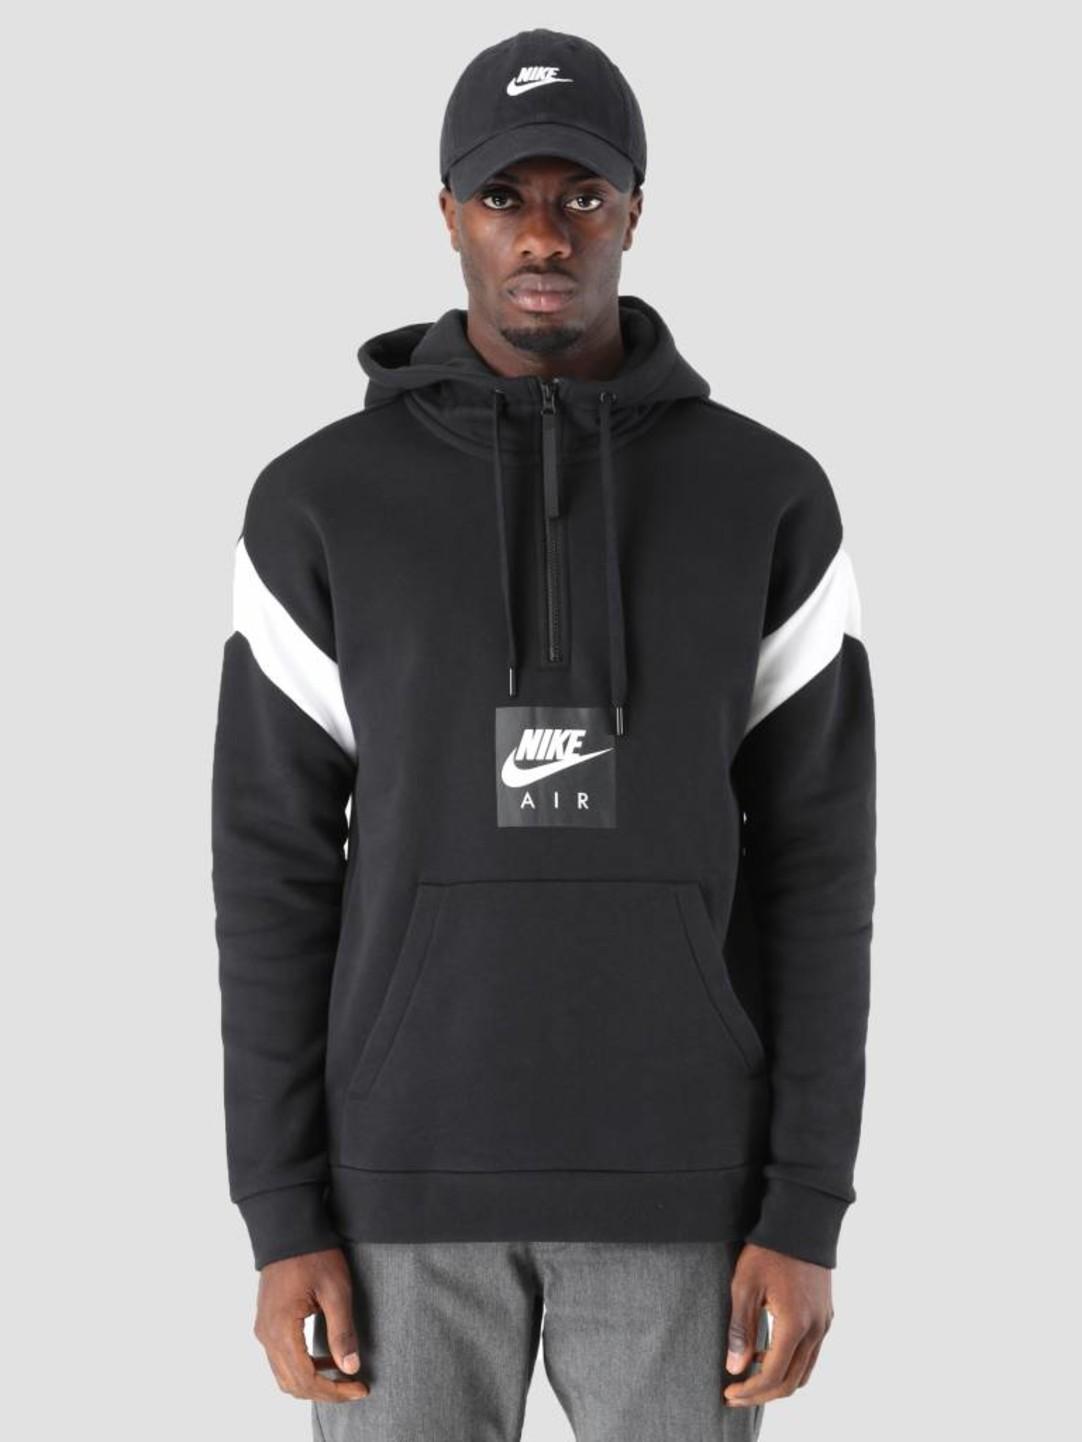 Nike Nike Air Hoodie Black White 930454-010